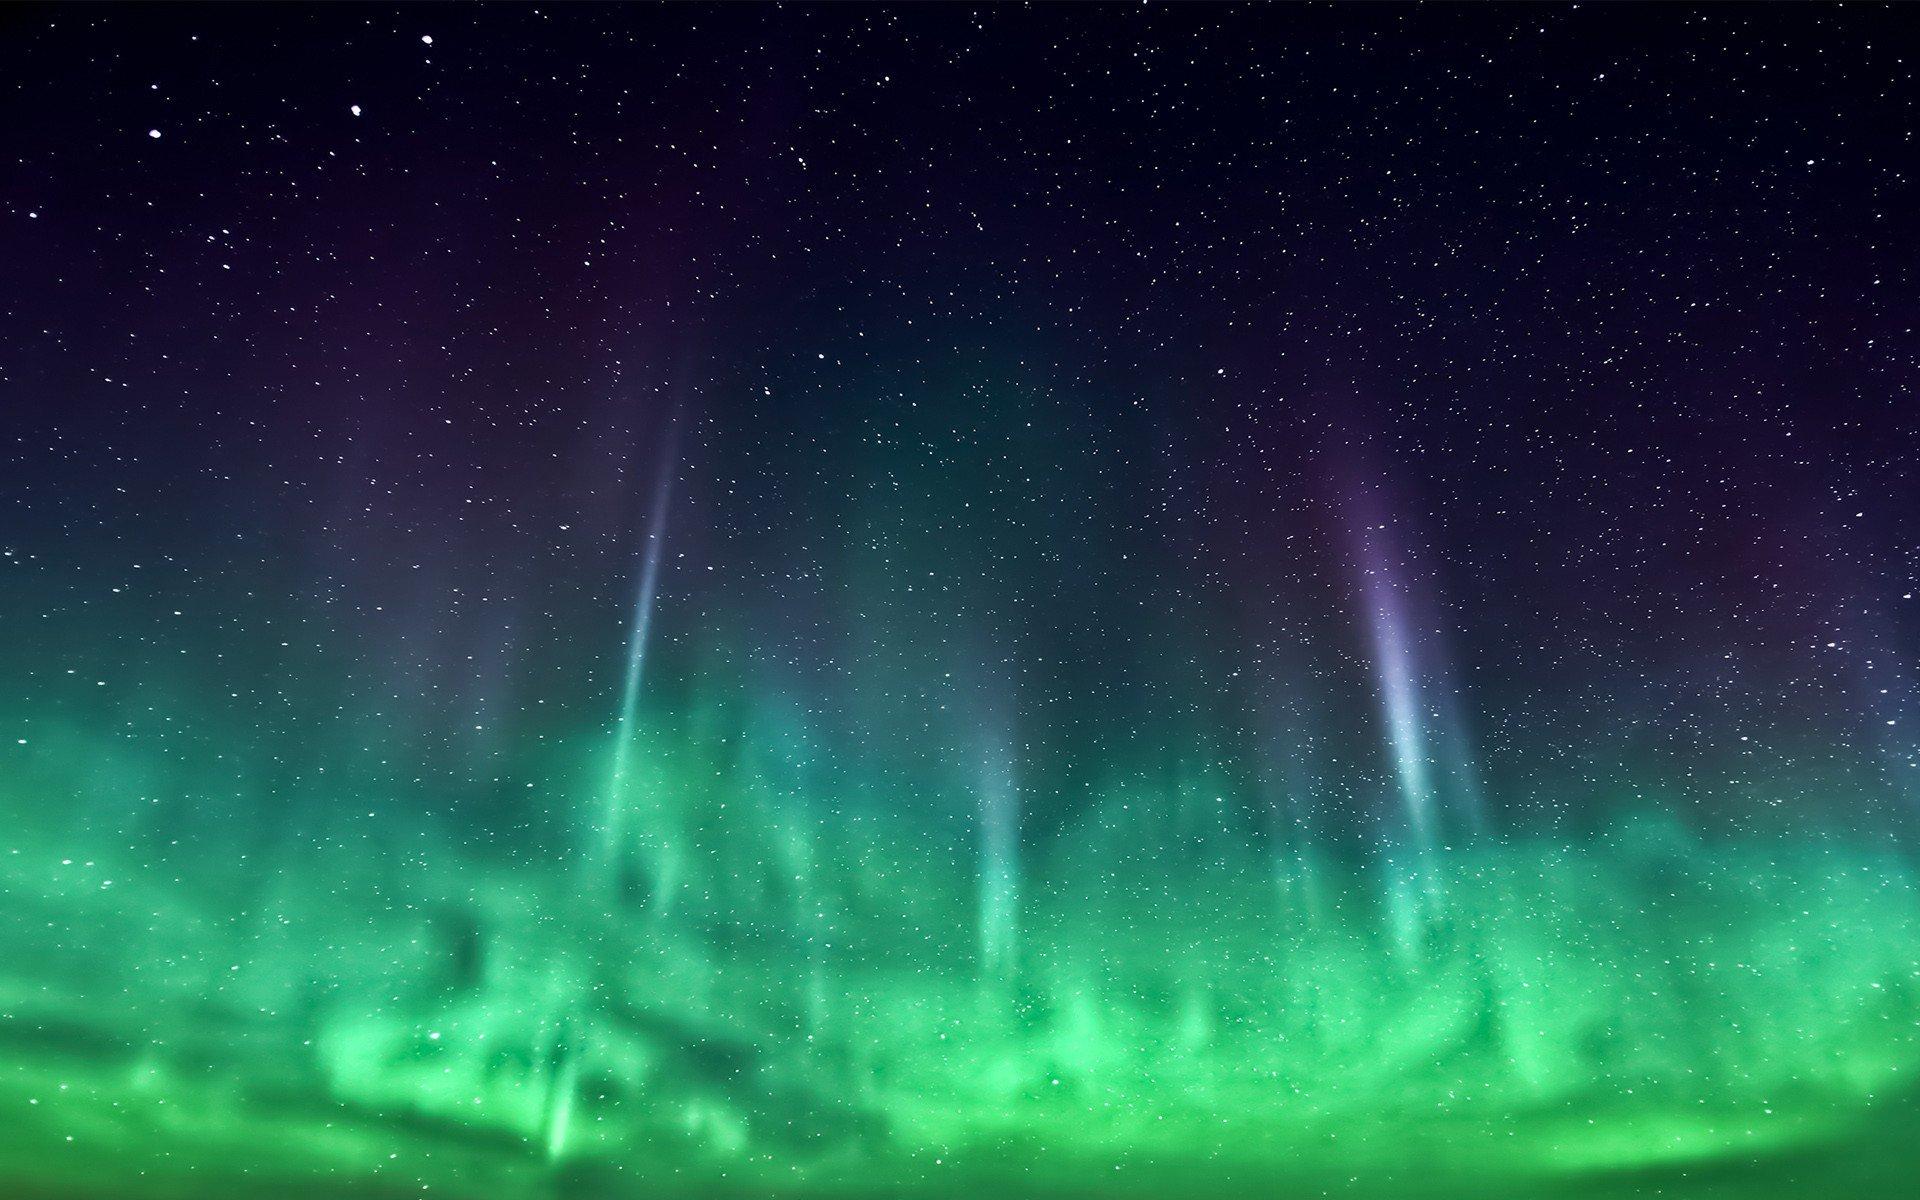 Aurora Sky, HD Digital Universe, 4k Wallpapers, Images ...